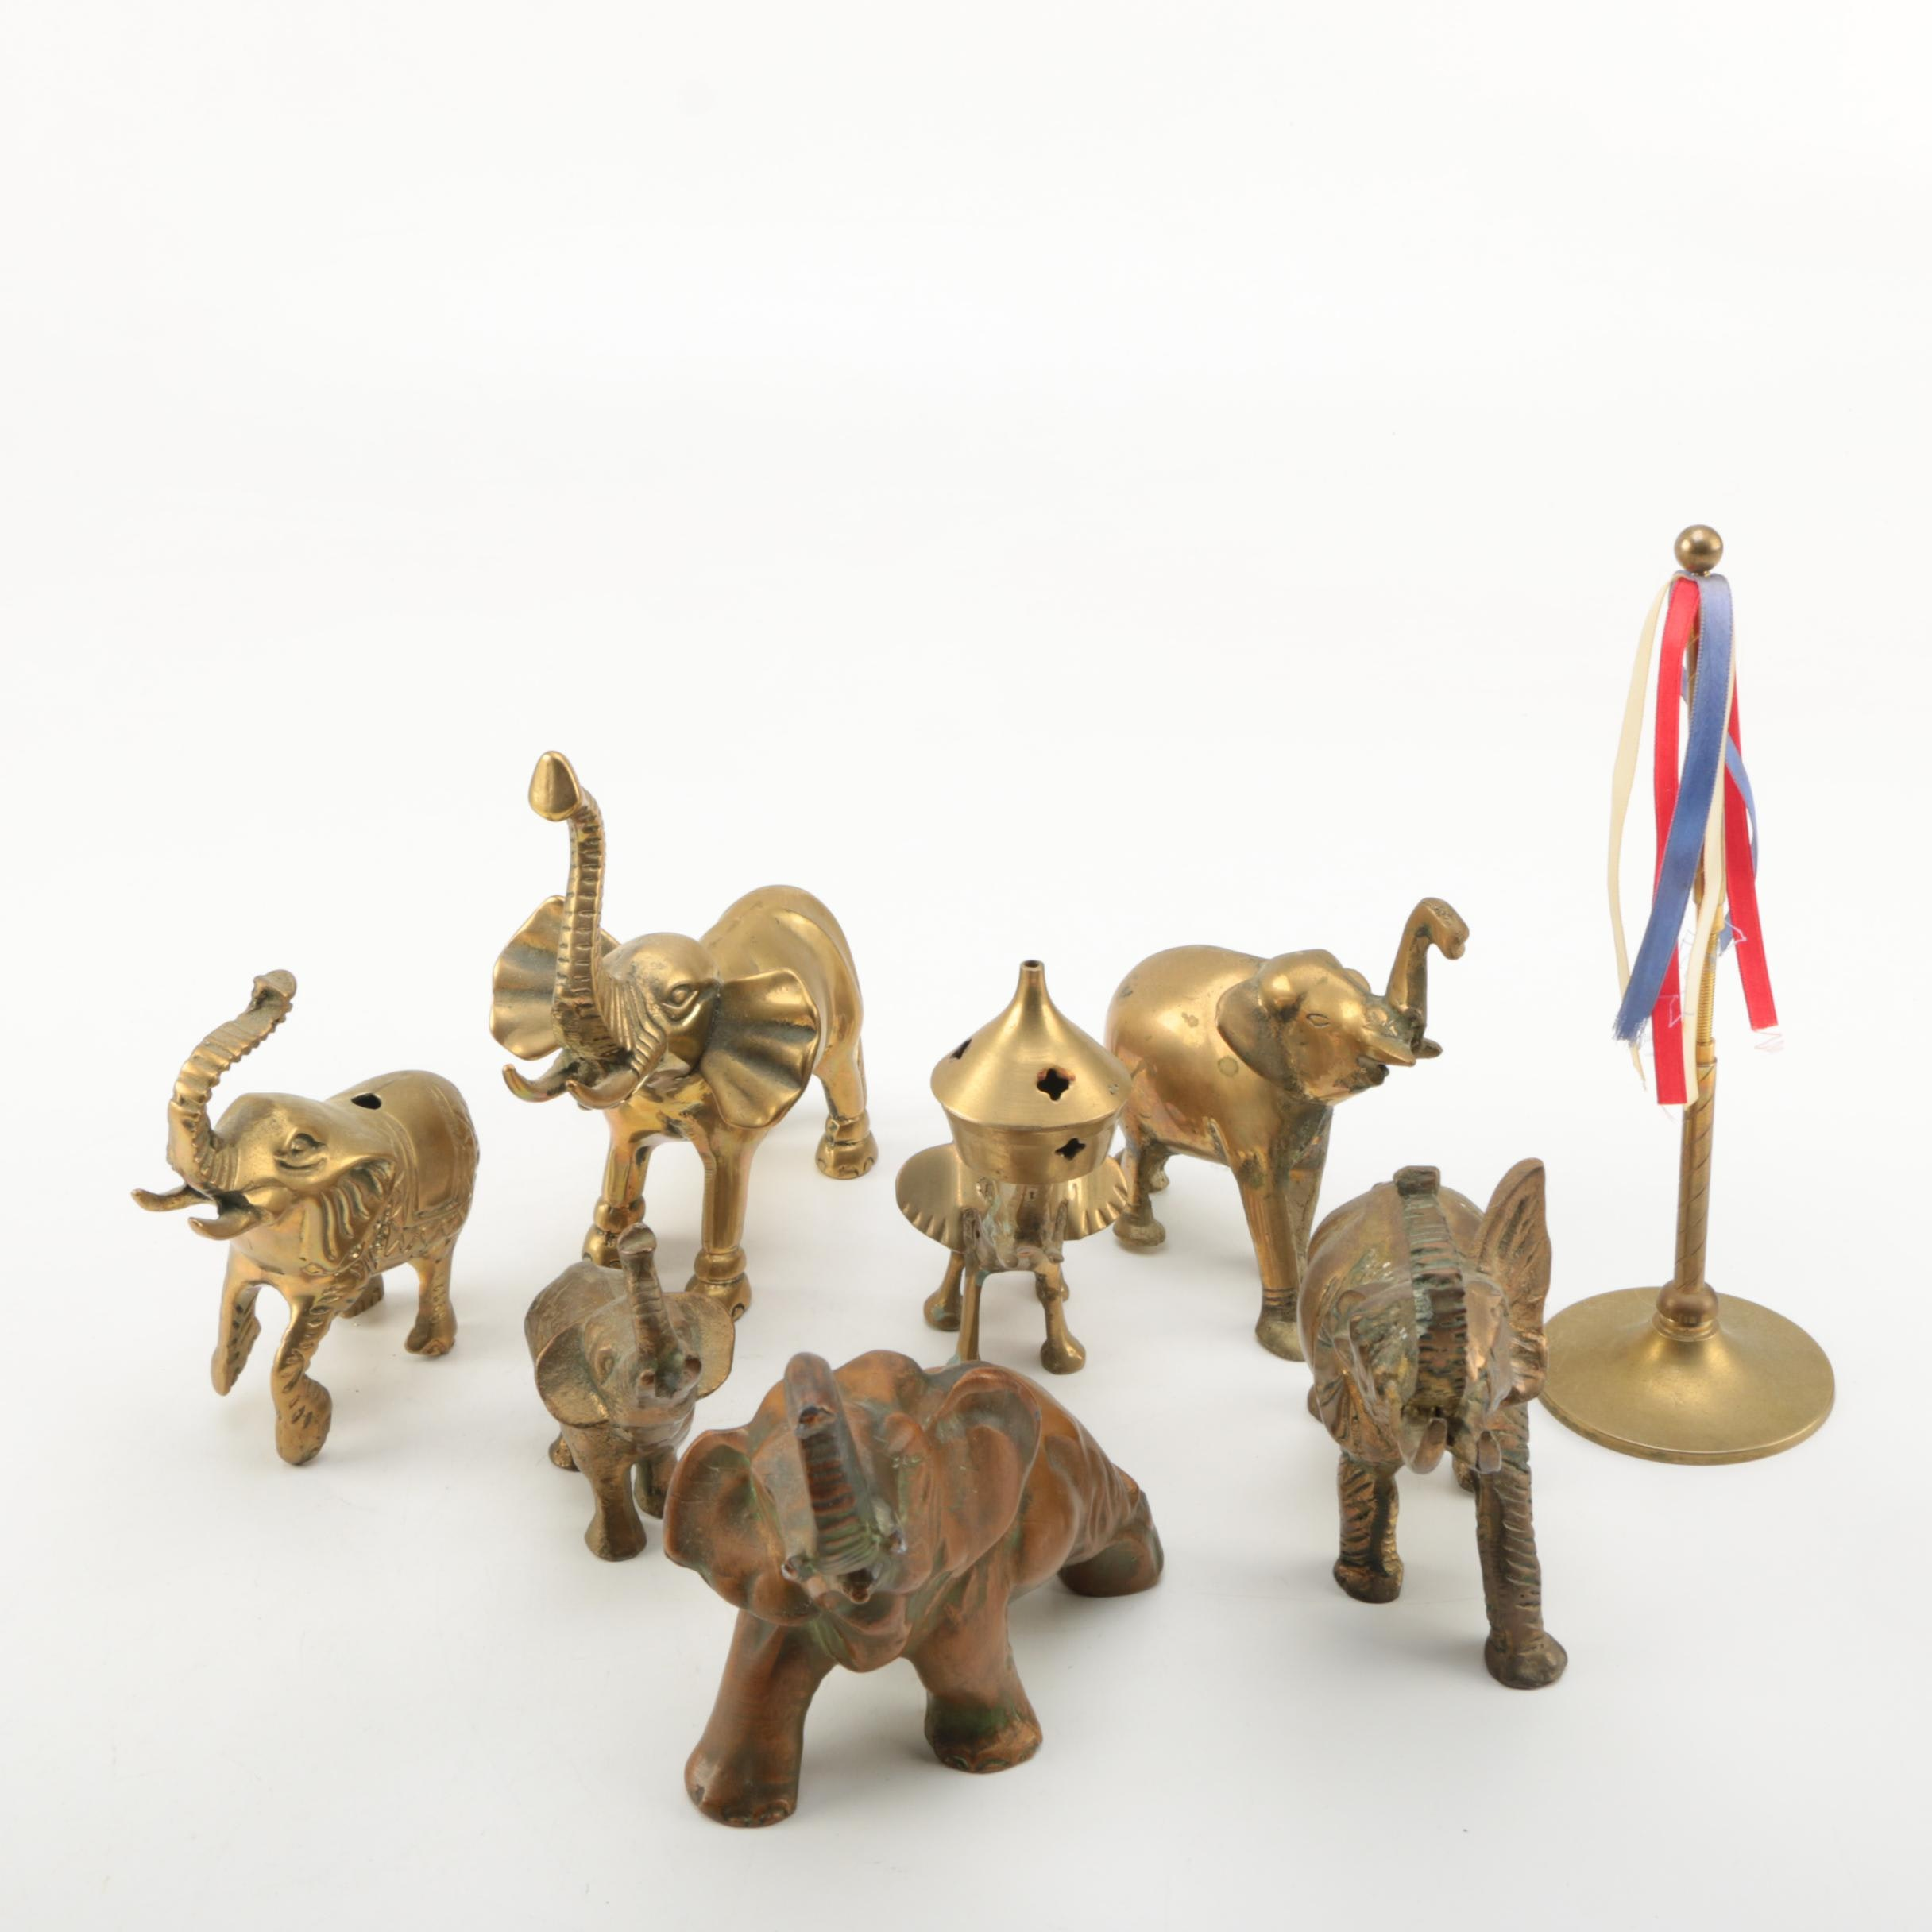 Brass Elephant Figurines and Maypole